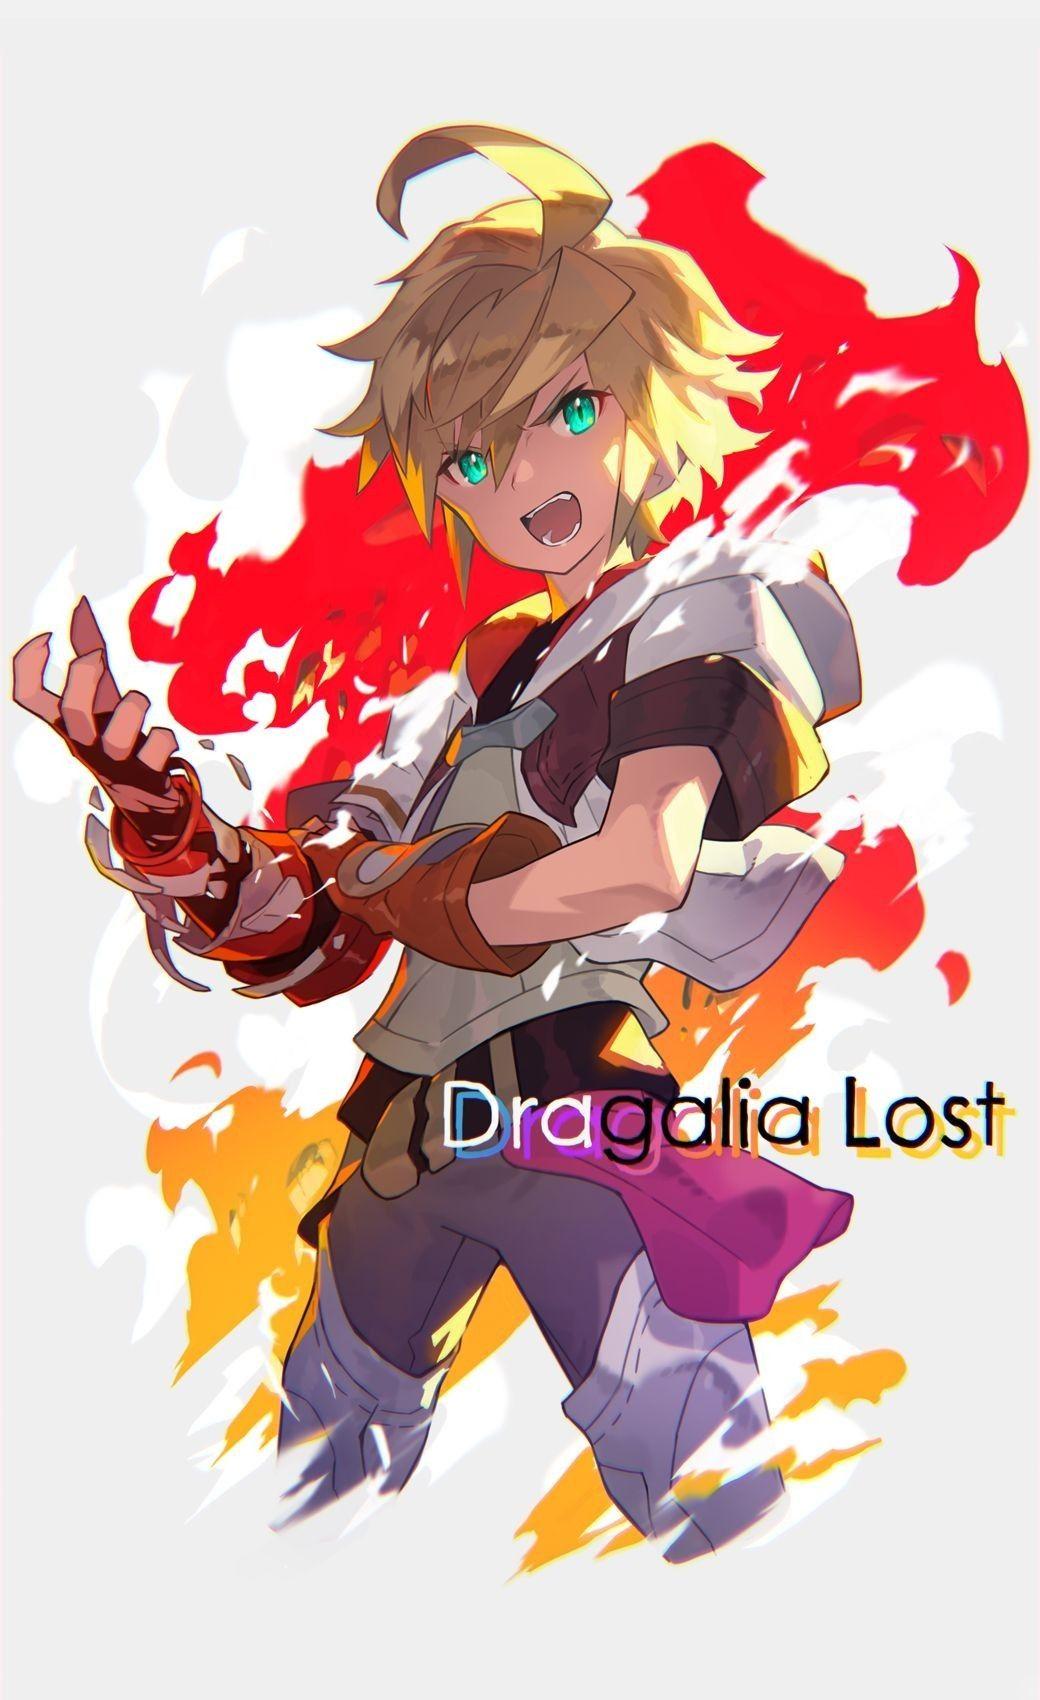 Pin By Saya On Dragalia Lost Character Design Inspiration Character Art Lost Art